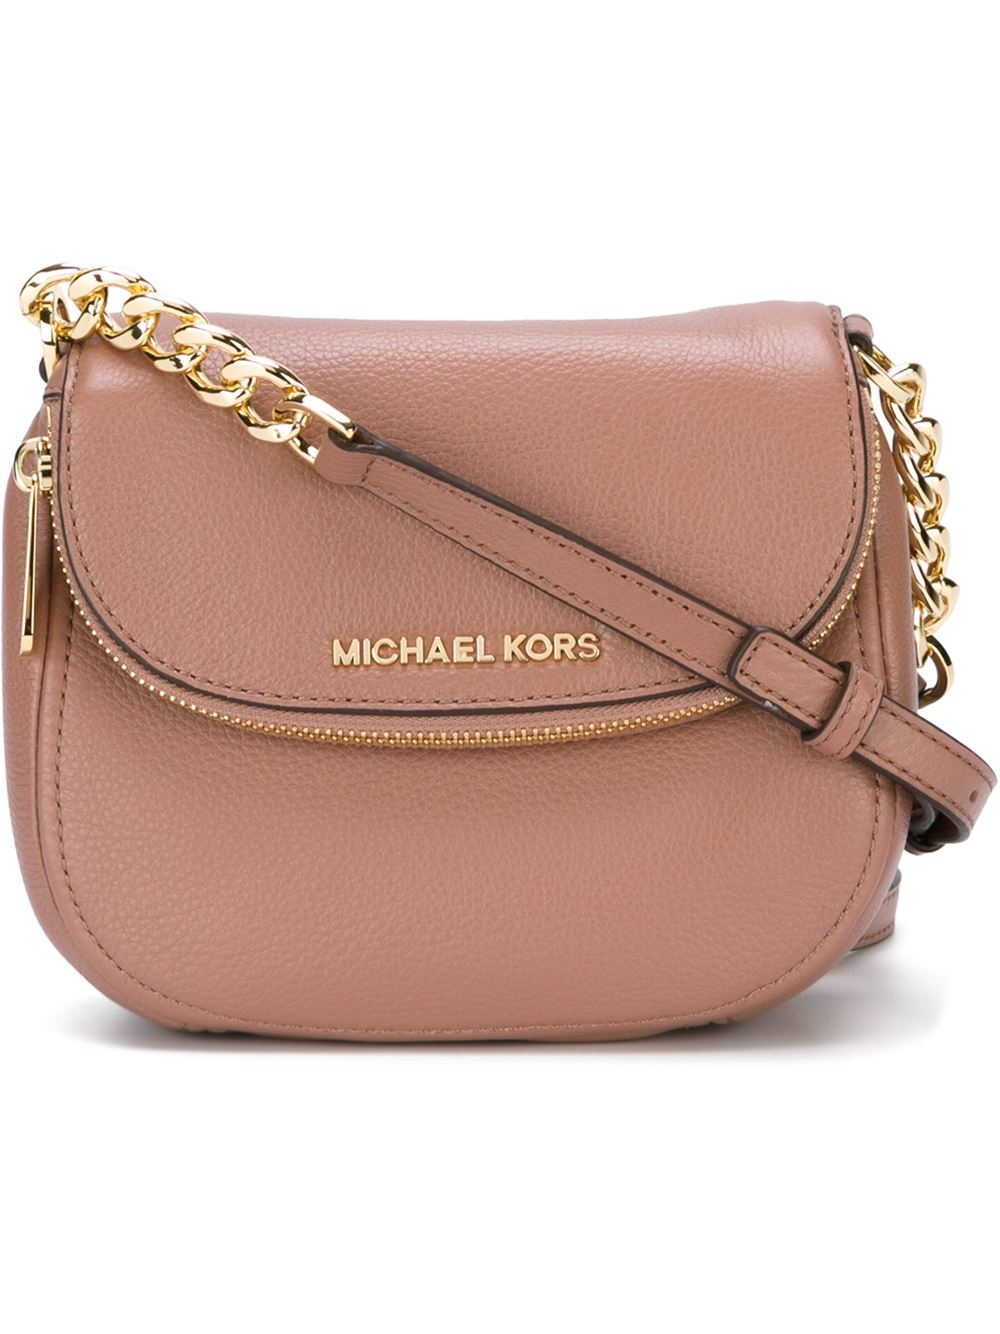 467db79cb3fe ... new zealand lyst michael michael kors bedford crossbody bag in pink  008af a194d